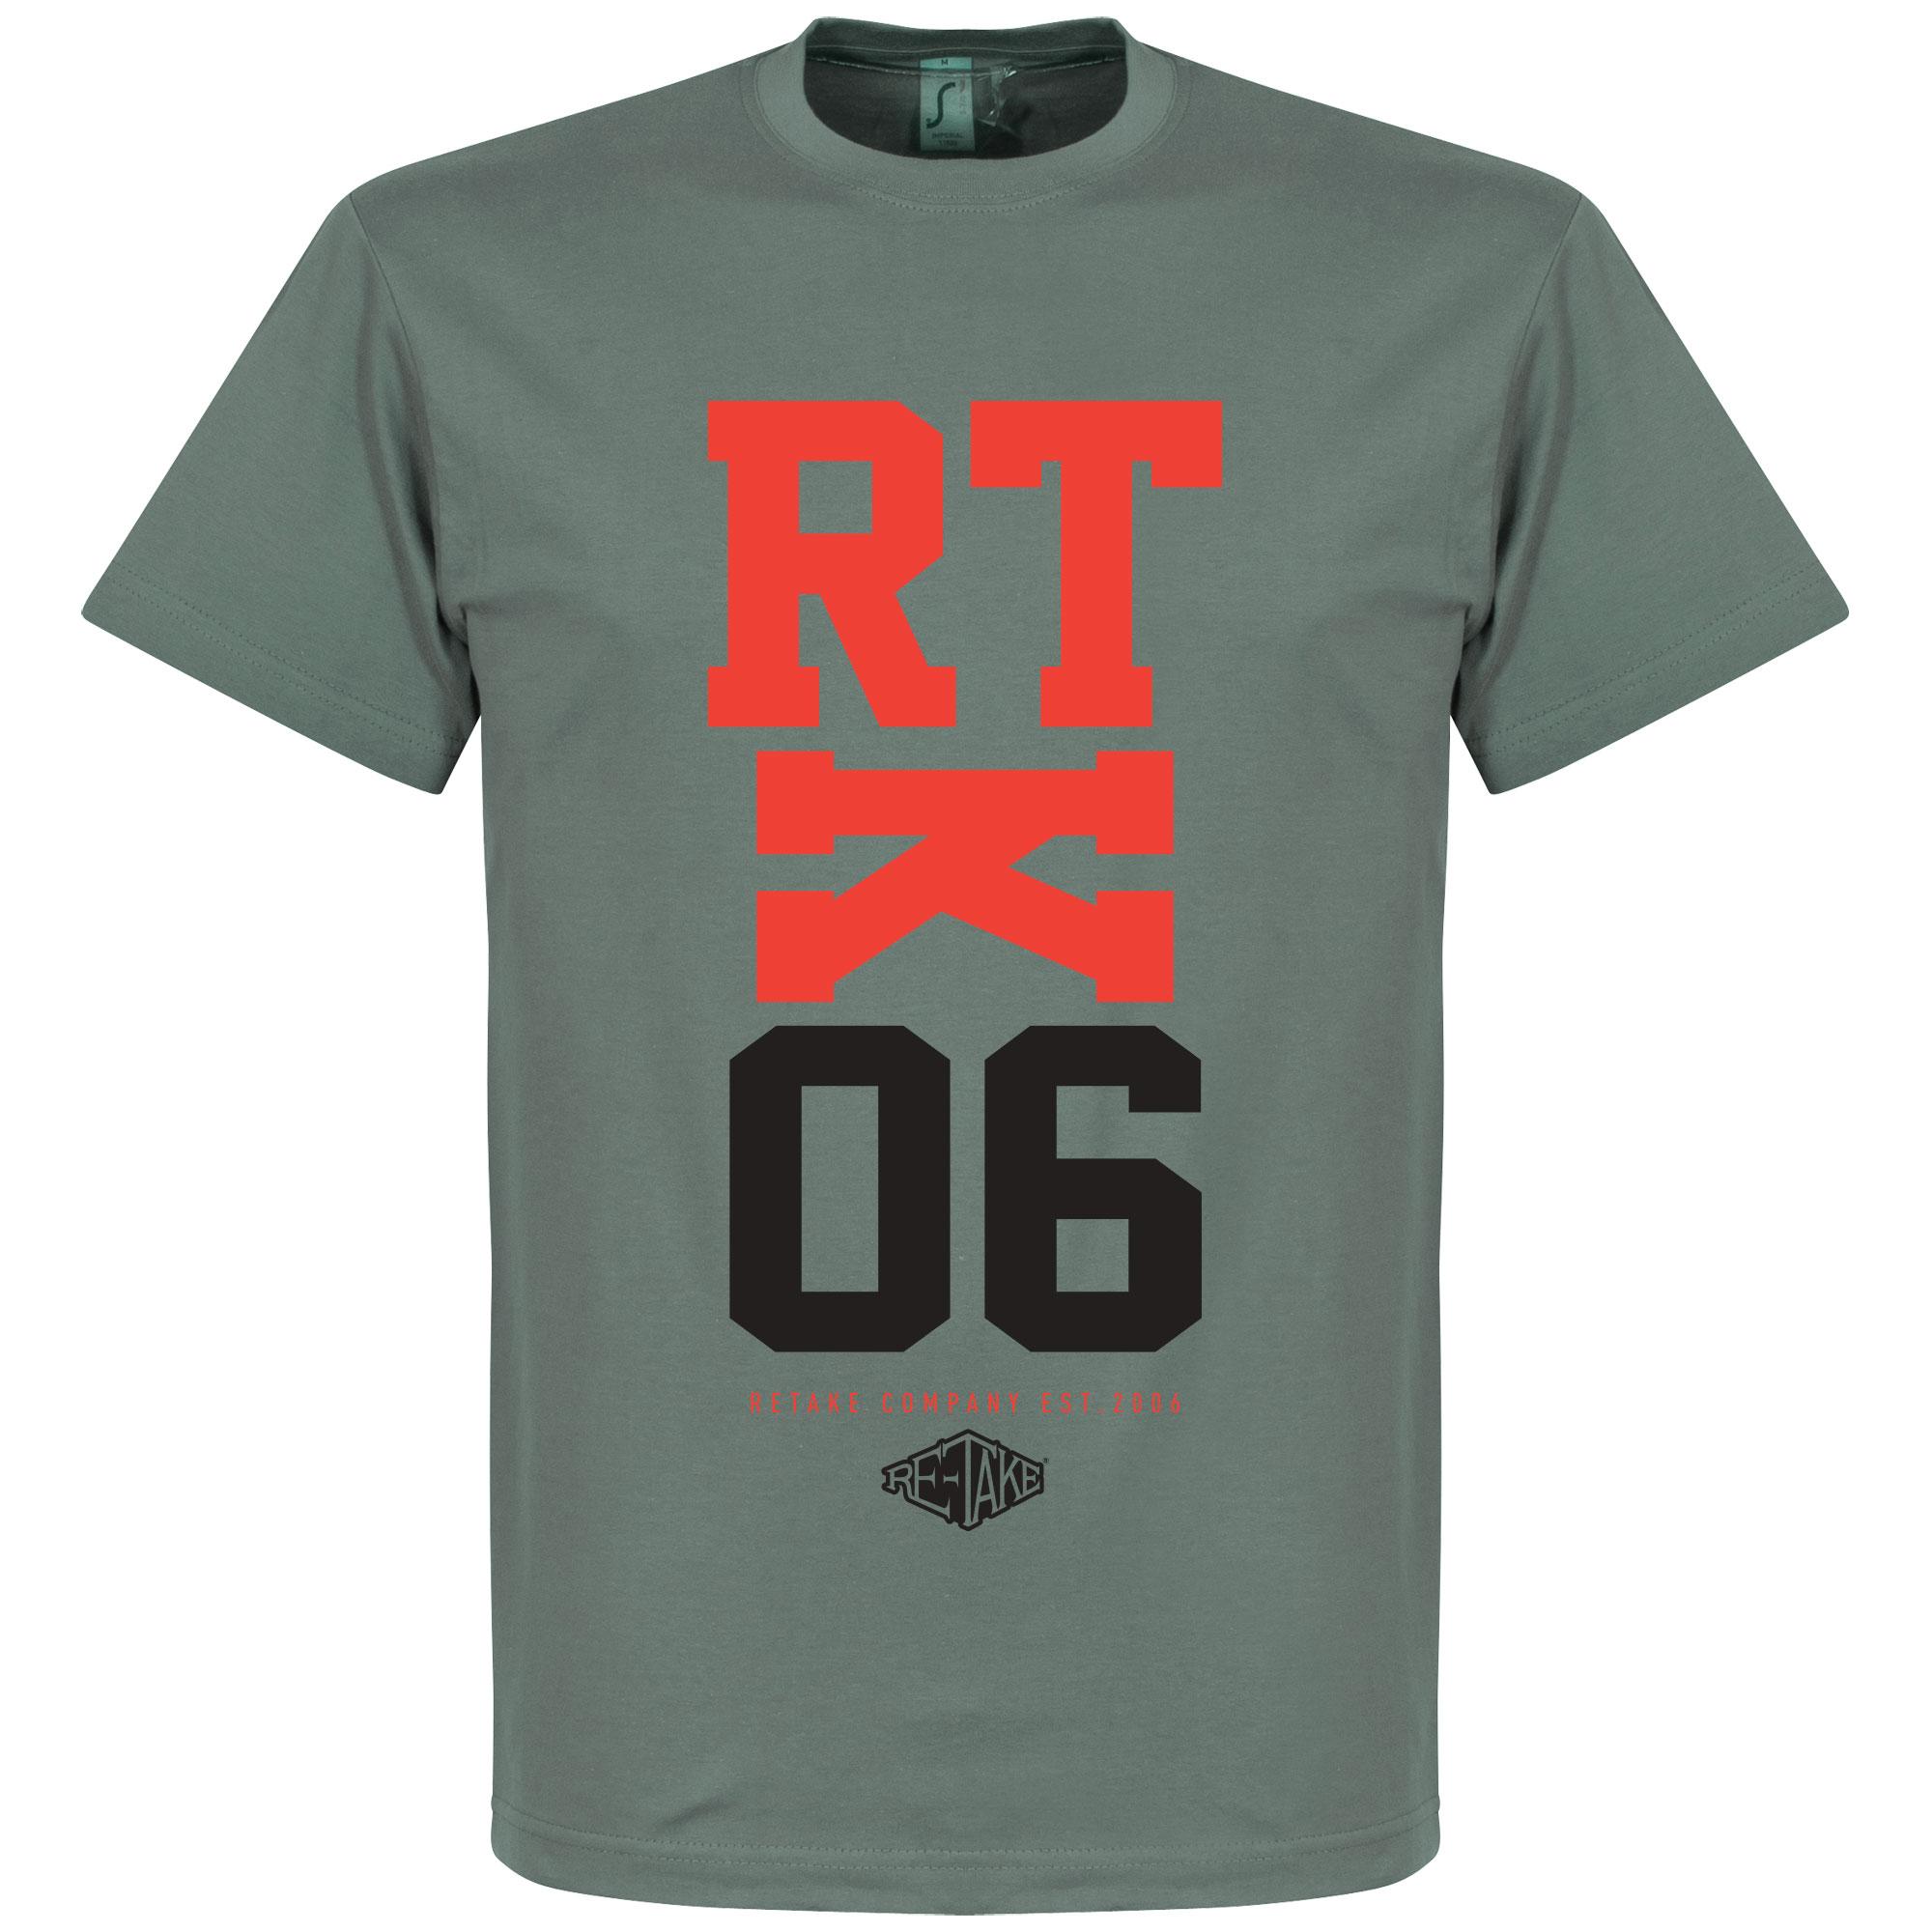 Retake RTK06 T-Shirt – Zink